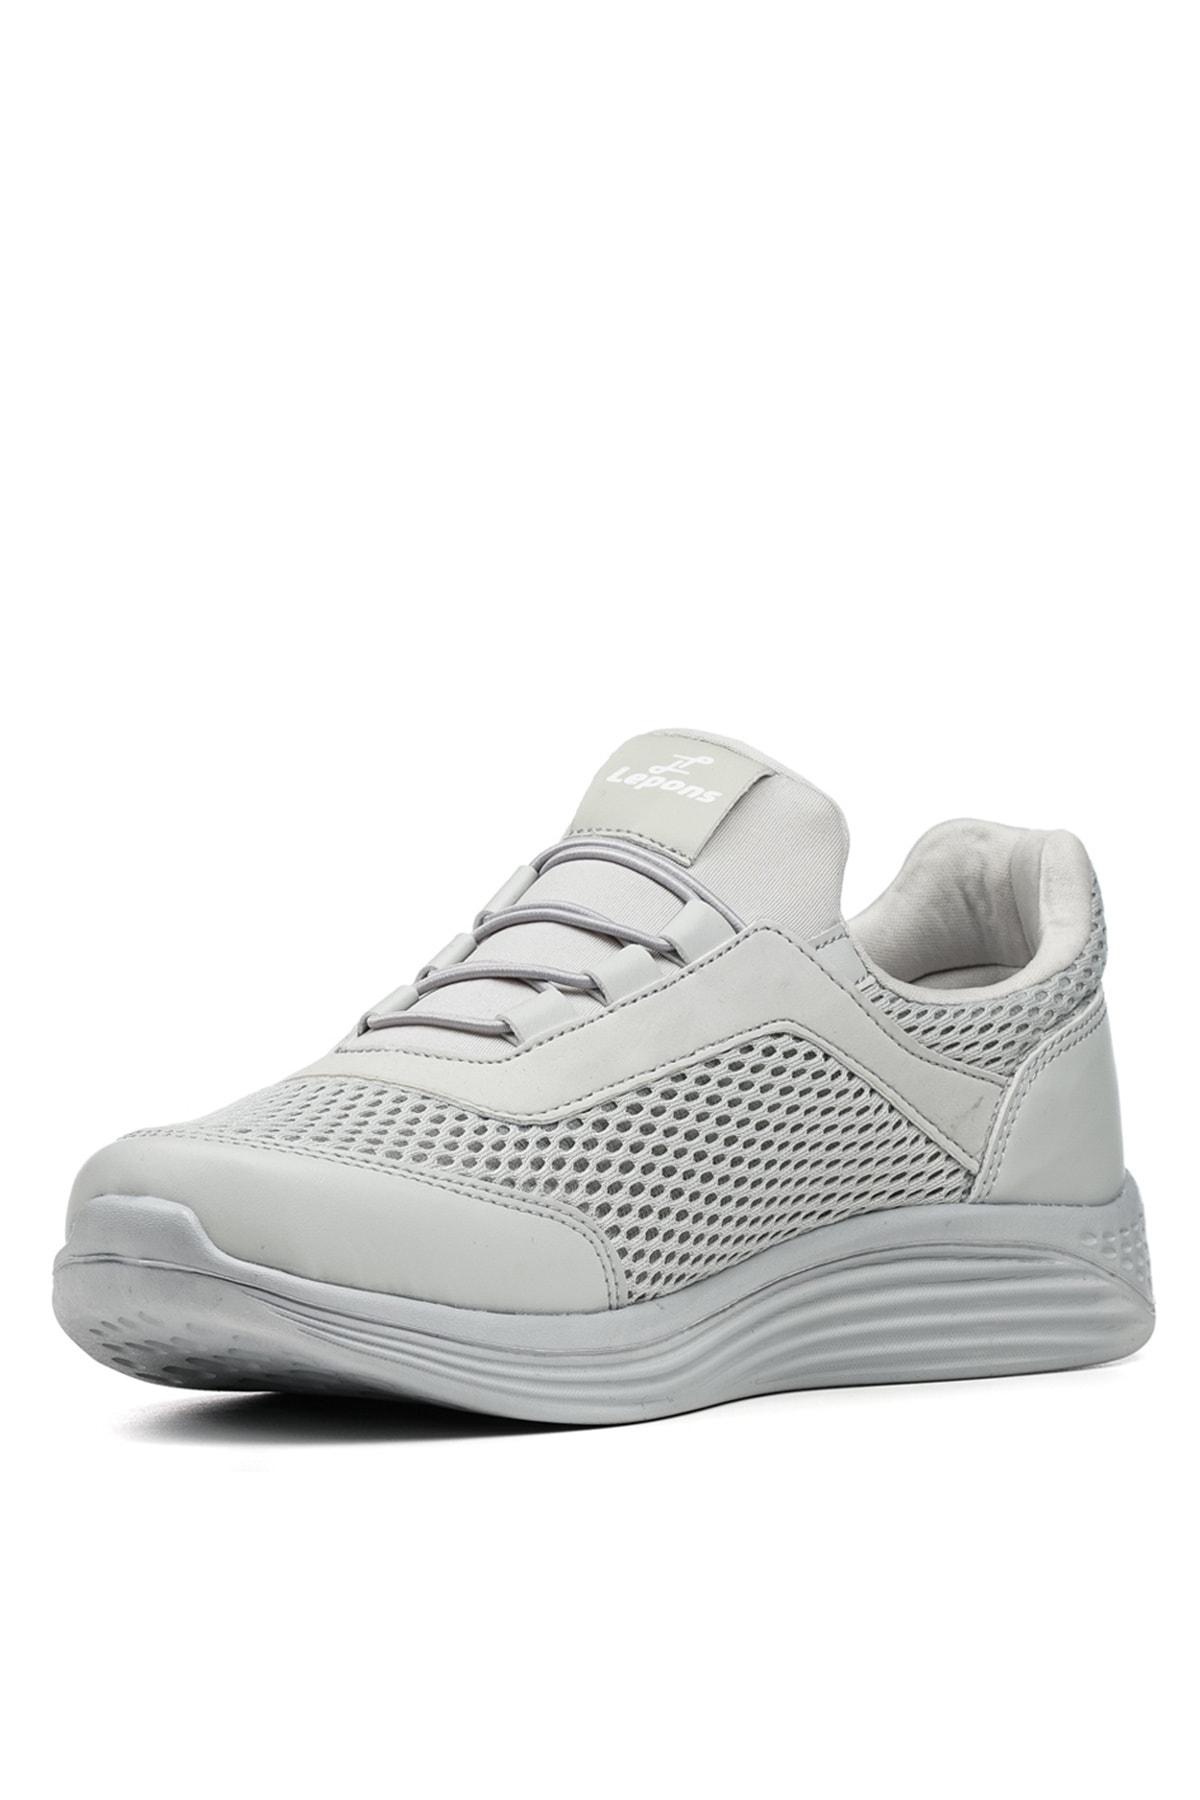 ICELAKE Unisex Sneaker Yb-aqlp0110 2